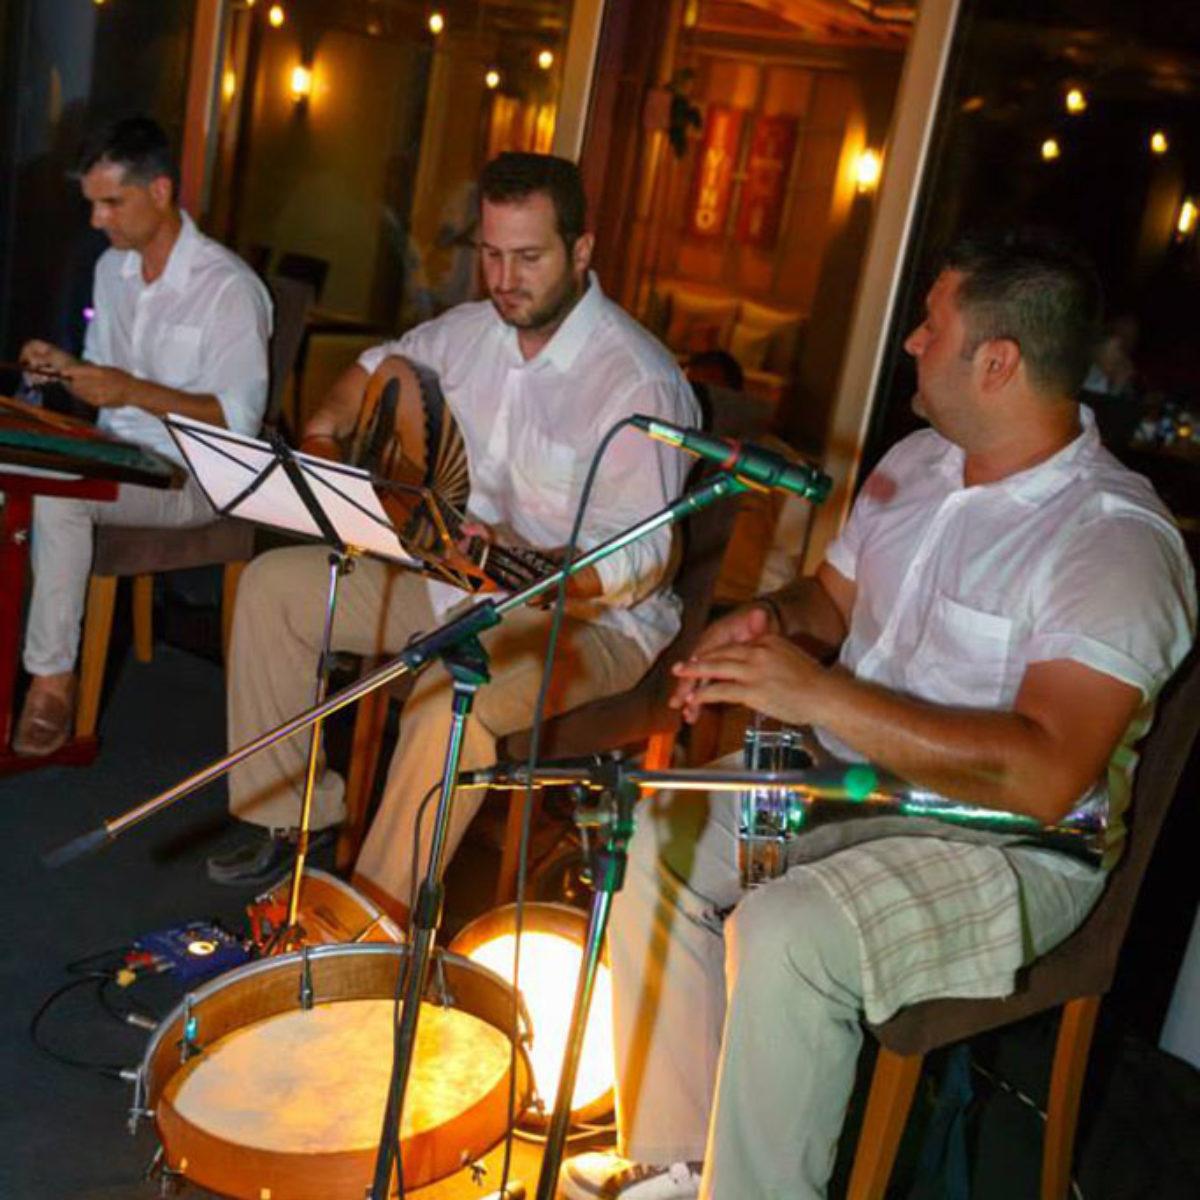 Yiamas Gastro Bar - Καλαμάτα - Μοντέρνα Ευρωπαϊκή Κουζίνα - Live events 11